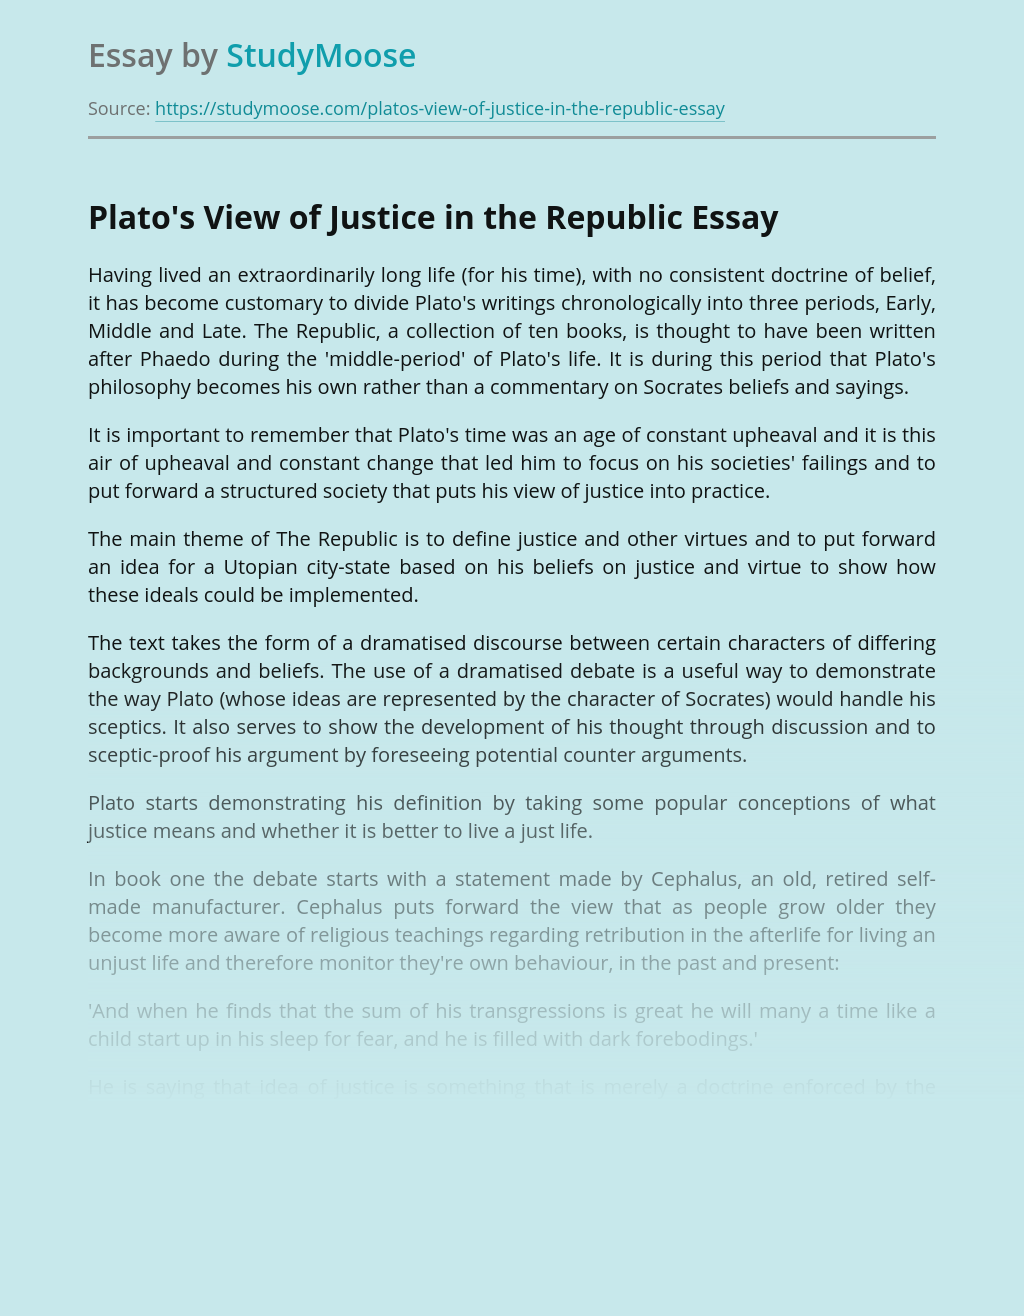 Plato's View of Justice in the Republic